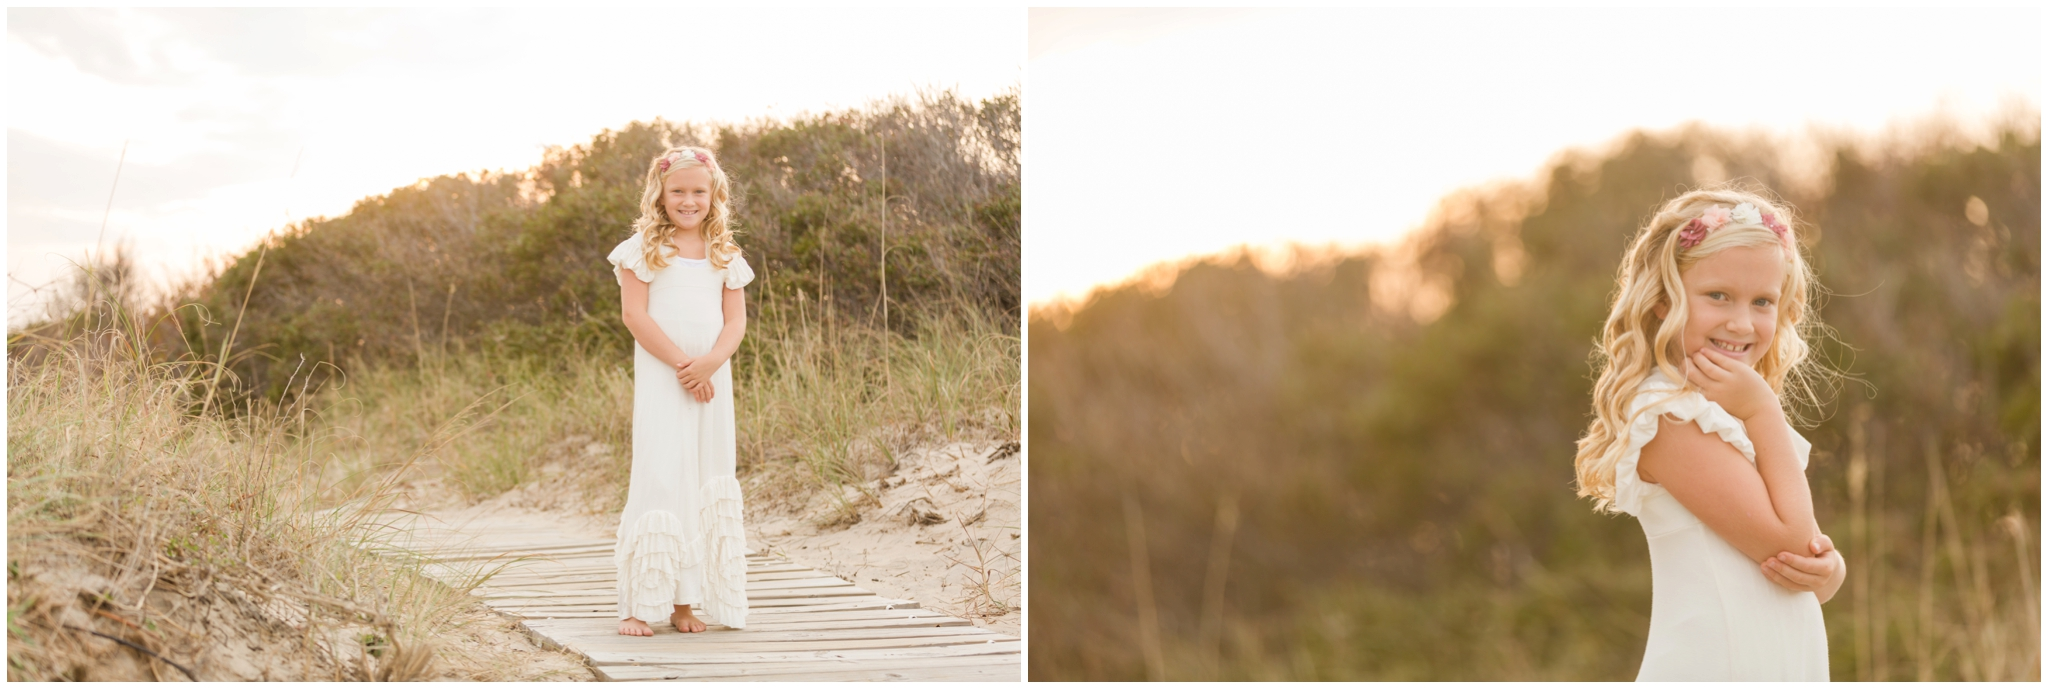 elovephotos virginia beach lds girl baptism photography